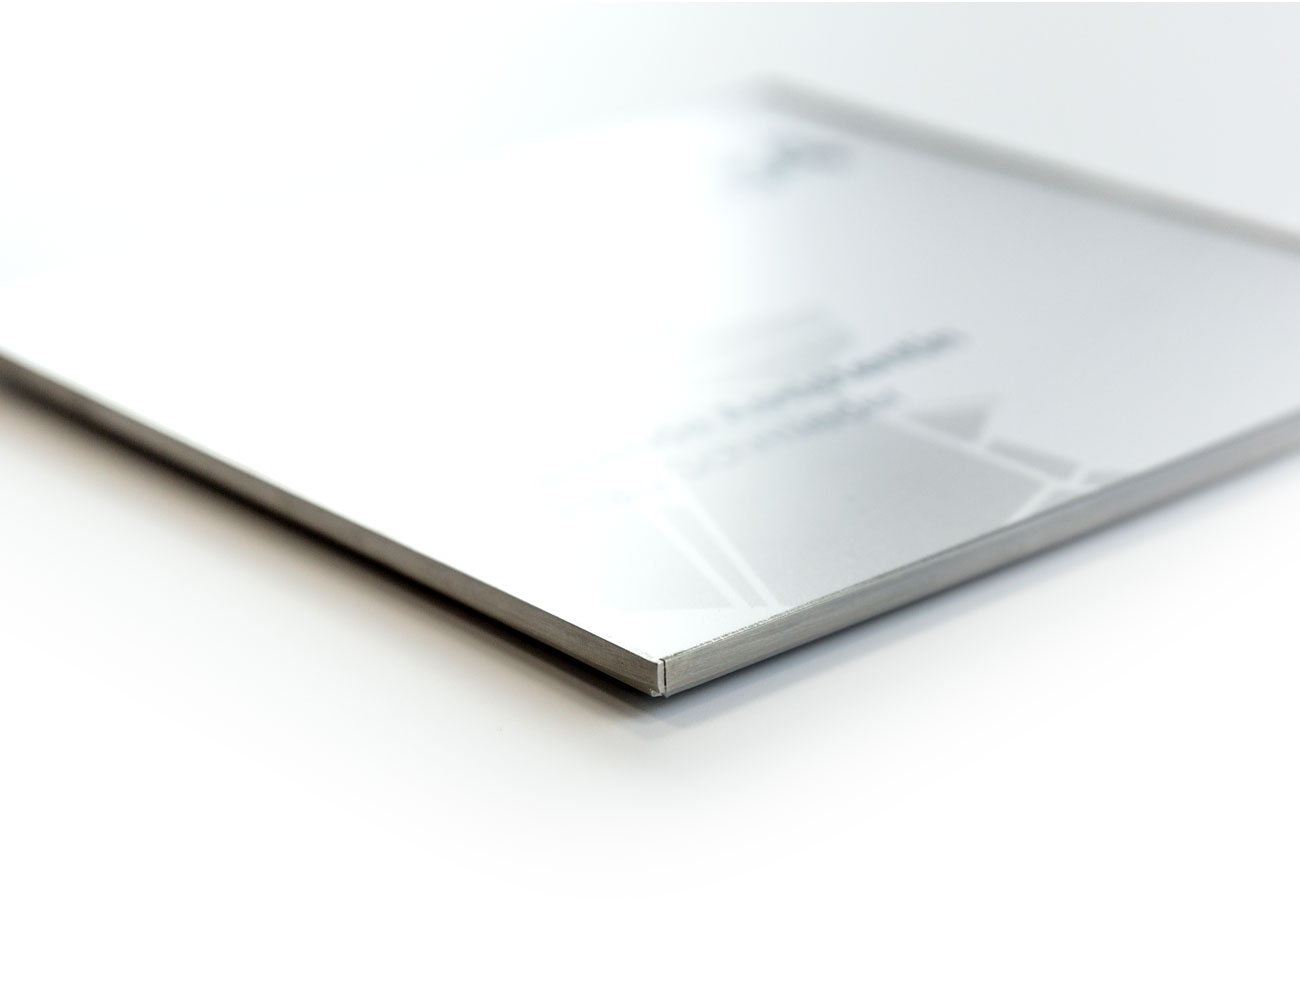 Türschild mit silbernem Rahmen im Profil